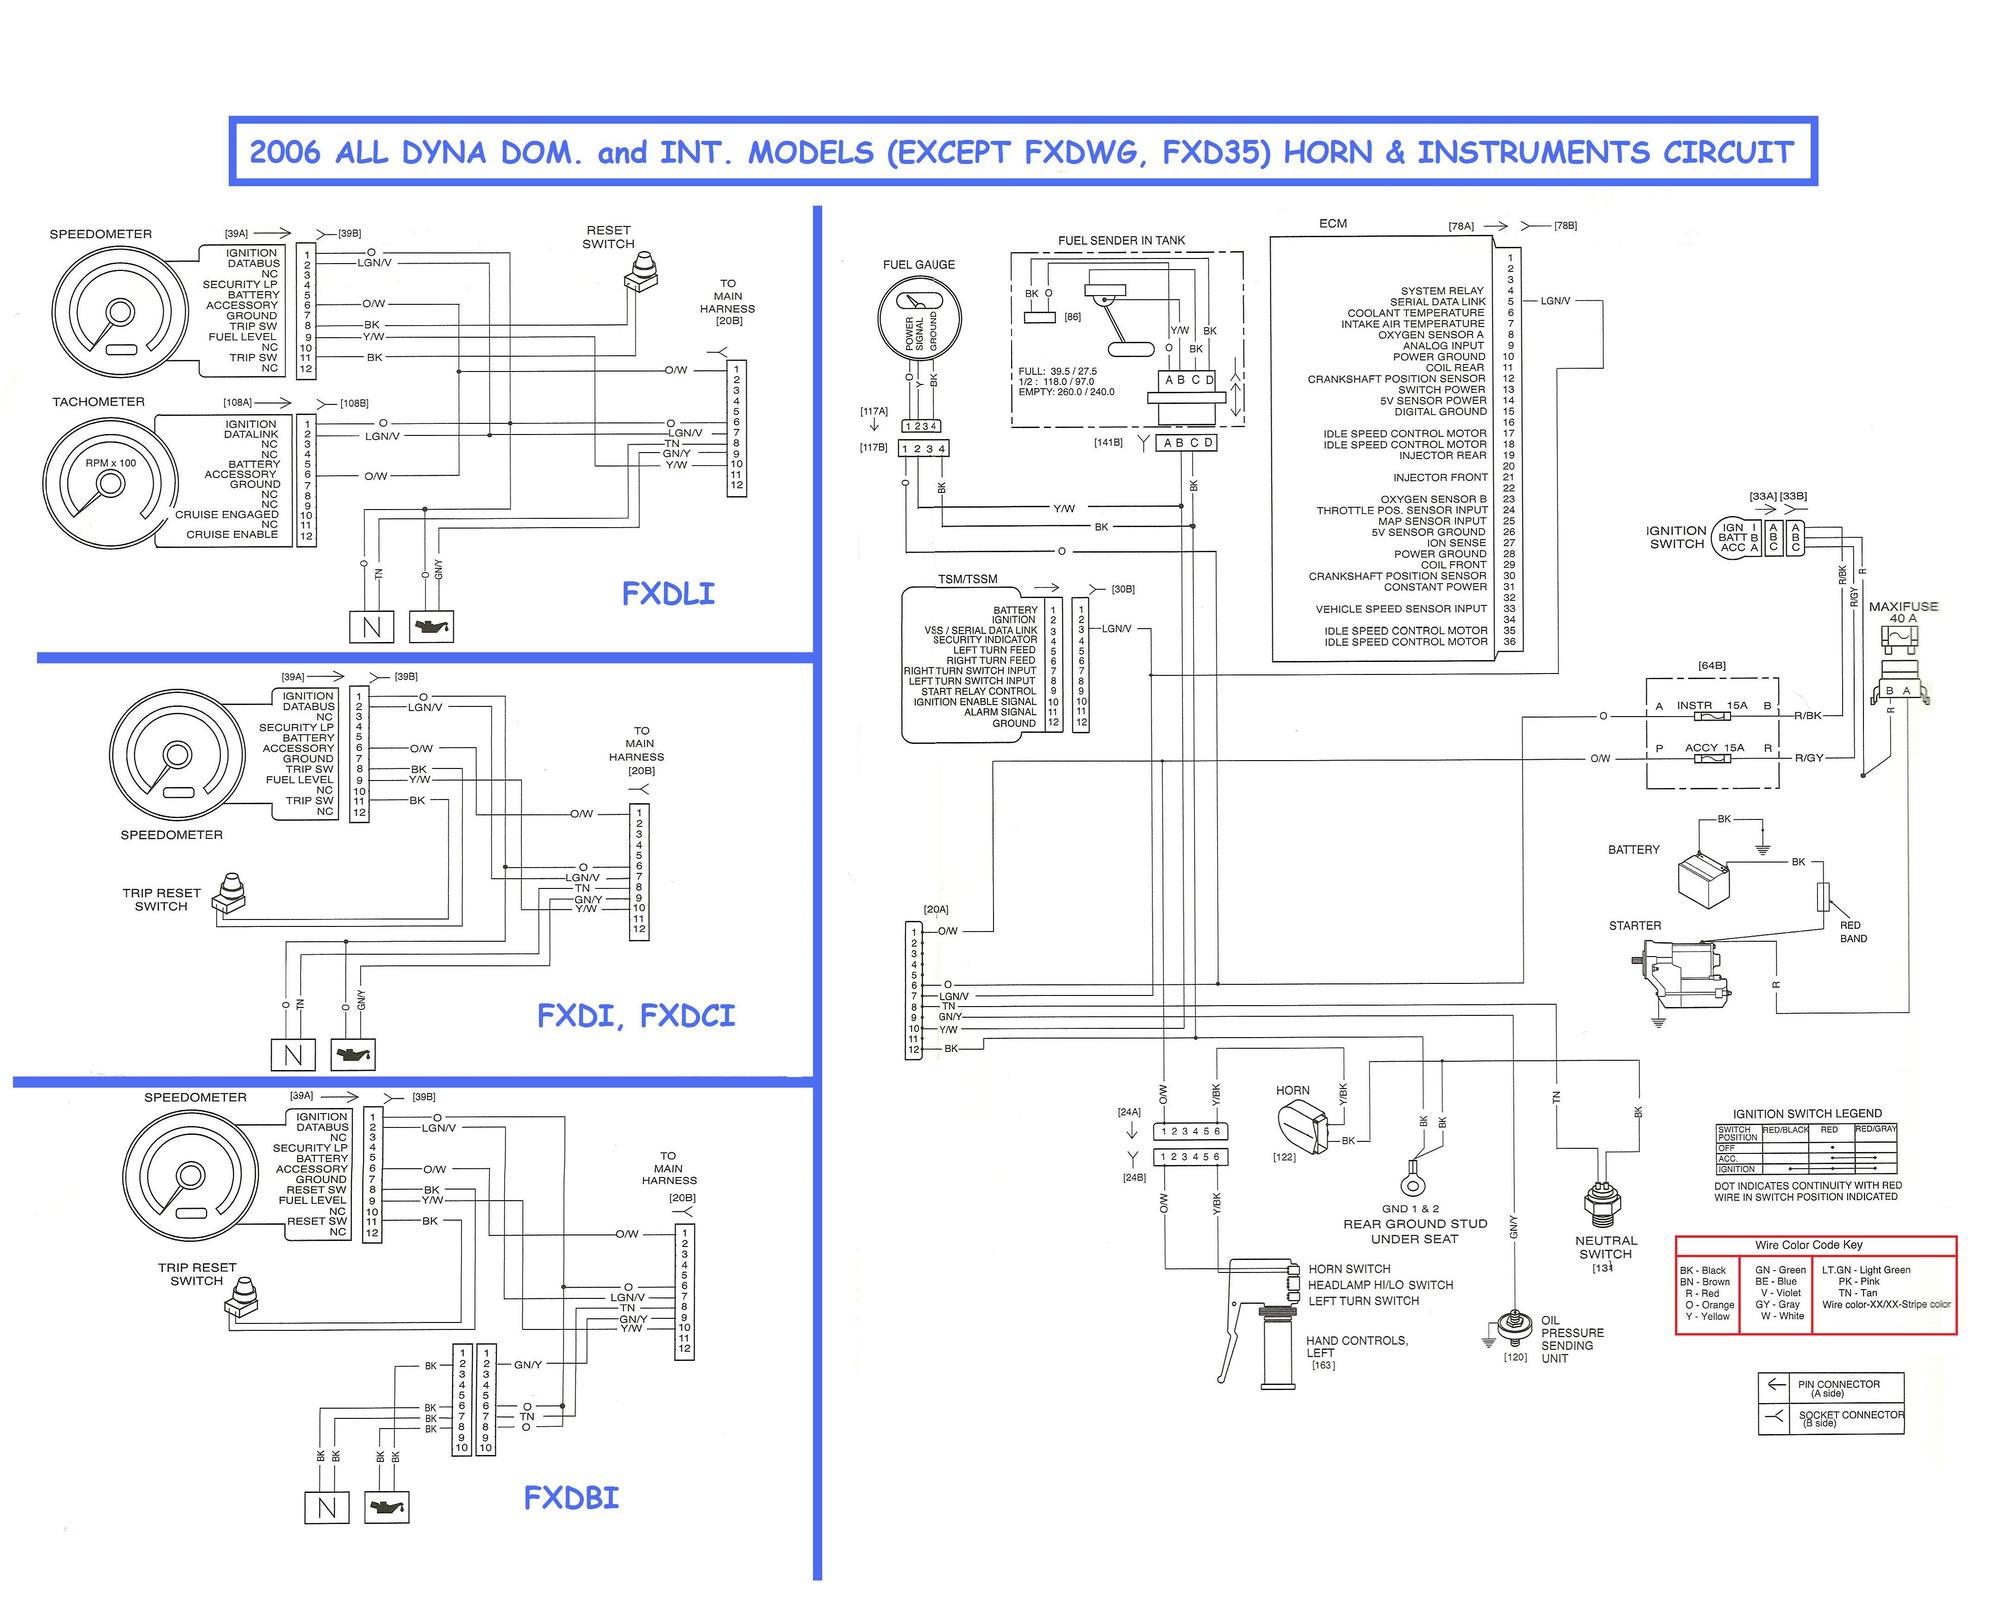 hight resolution of 1999 fxdl speedo swap to 5 wiring help harley davidson forums1999 harley fxst wiring diagram 7